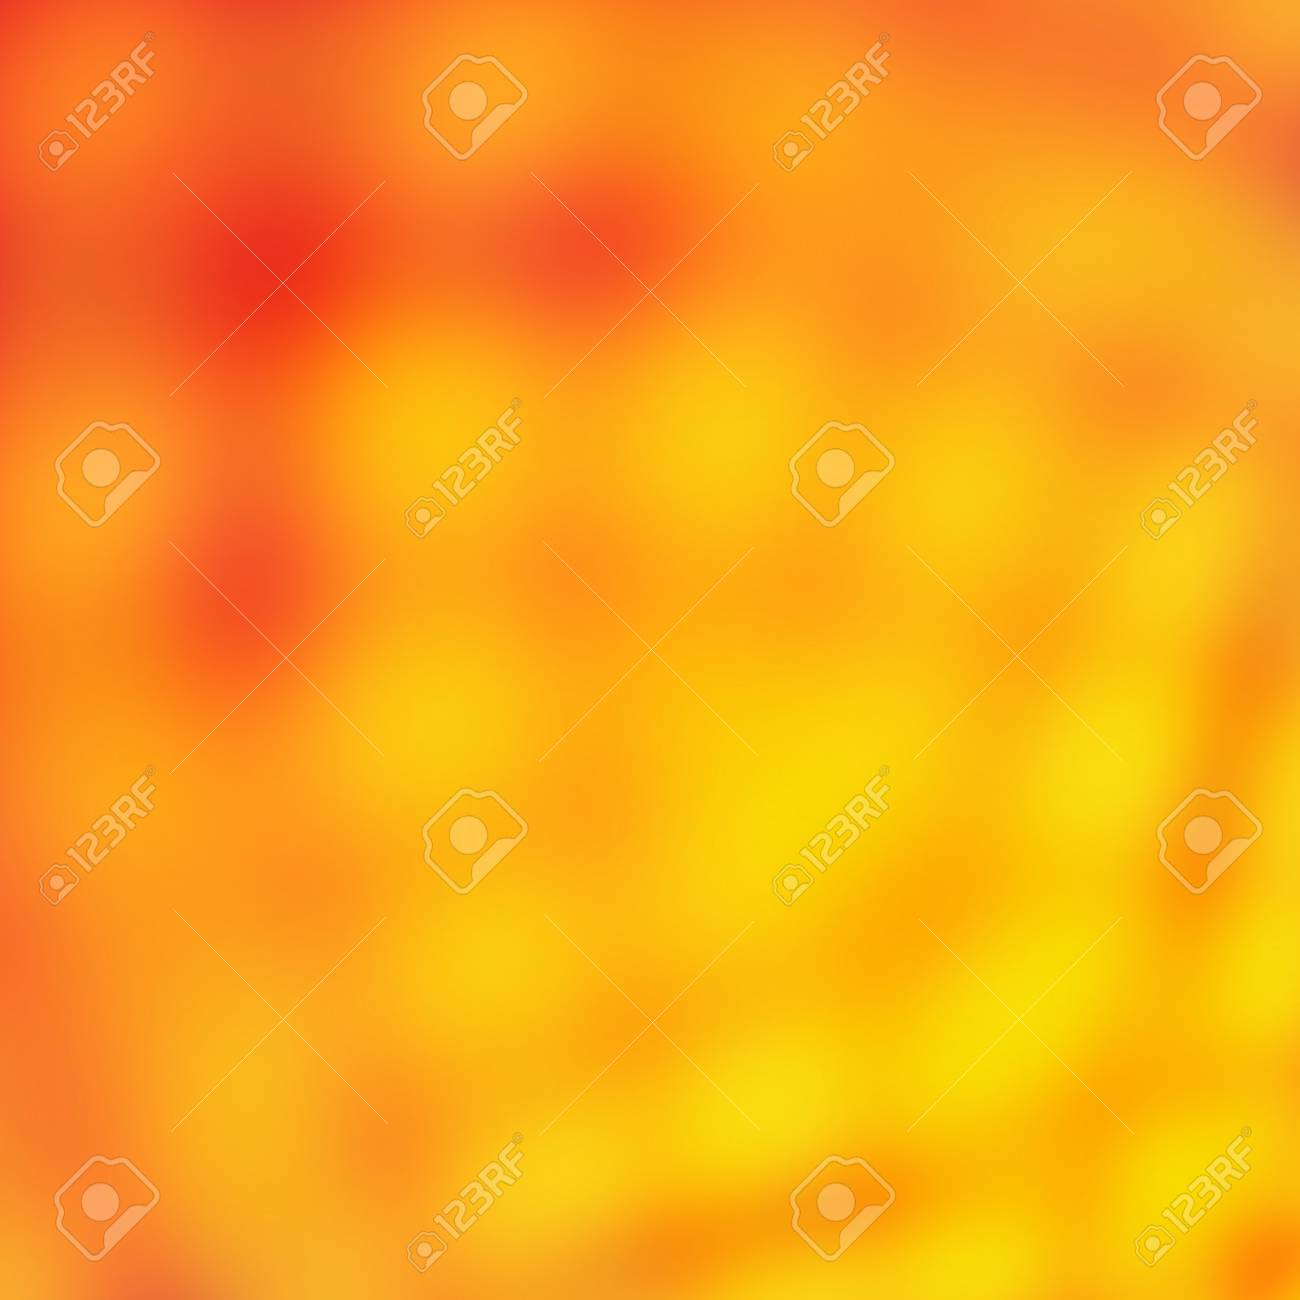 Summer Party Backdrop Orange Wallpaper Design